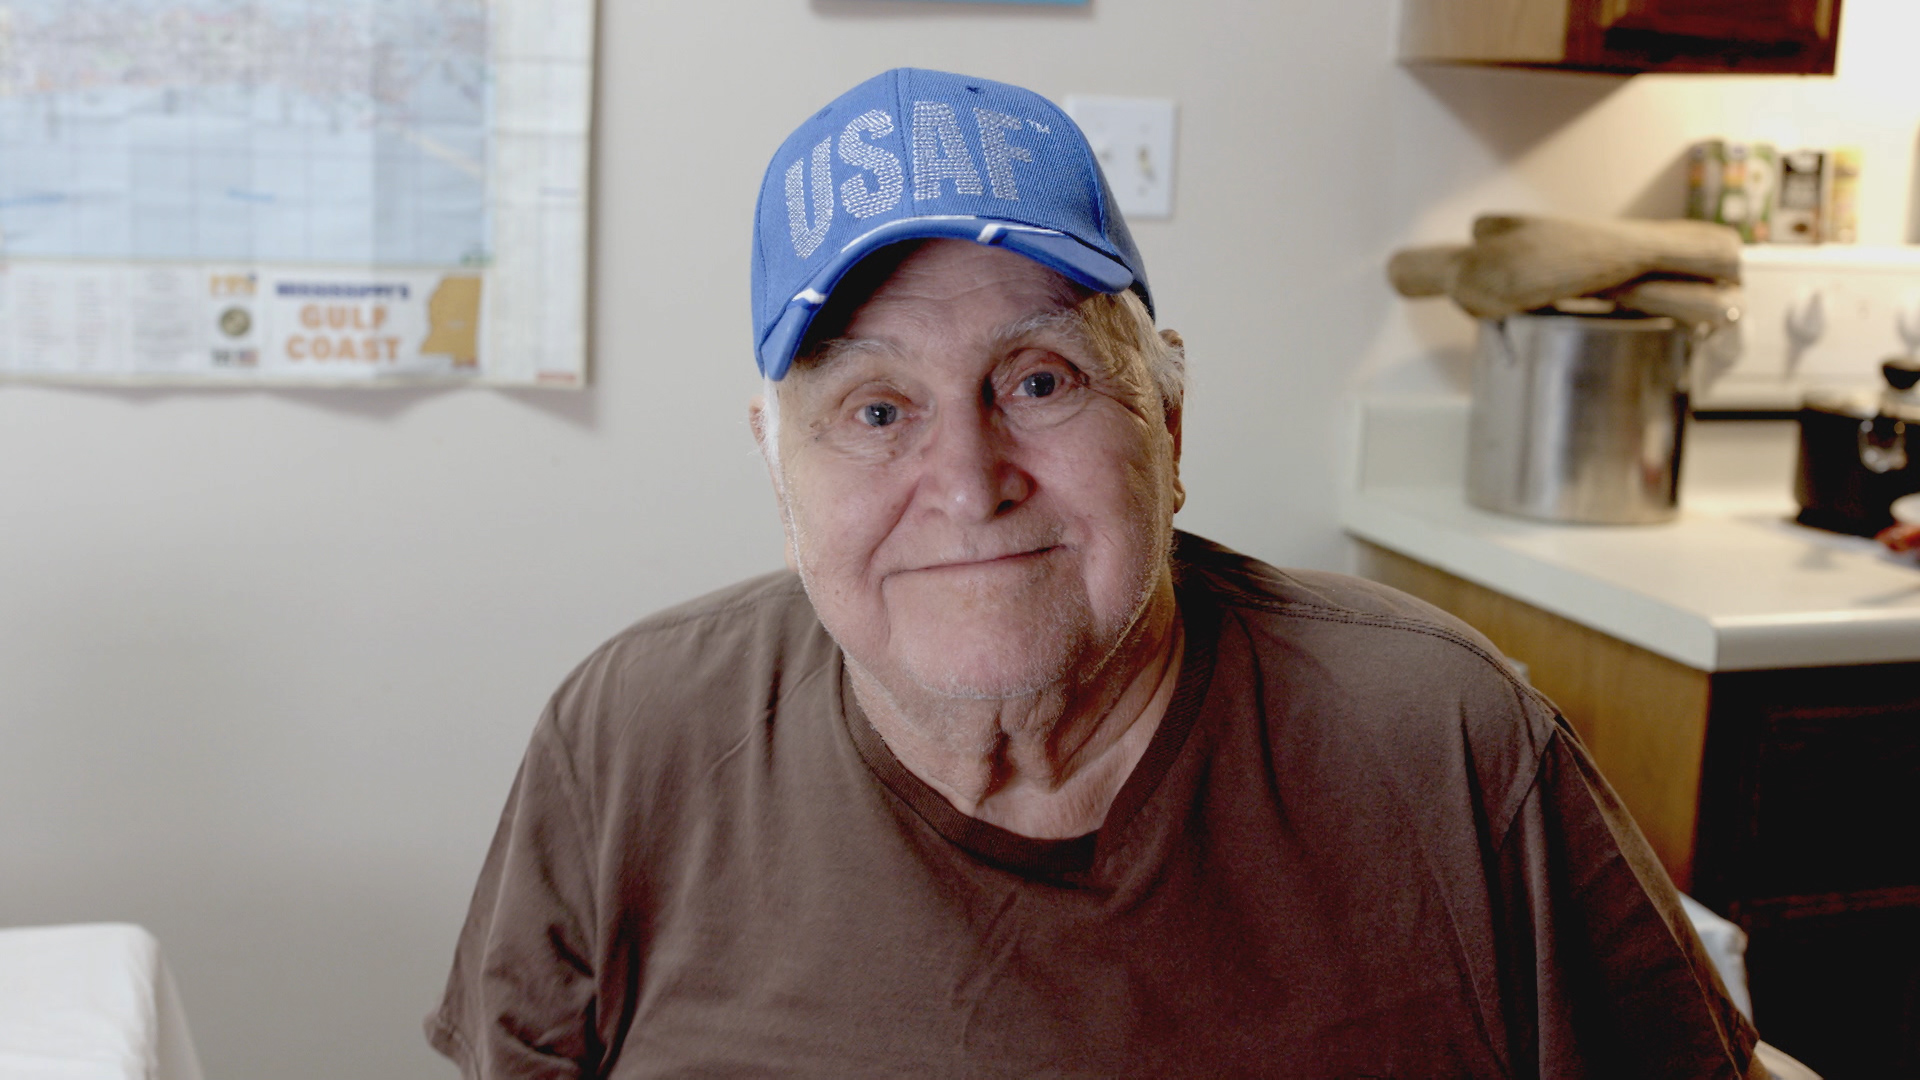 Ending Veteran Homelessness in Gulf Coast, MS